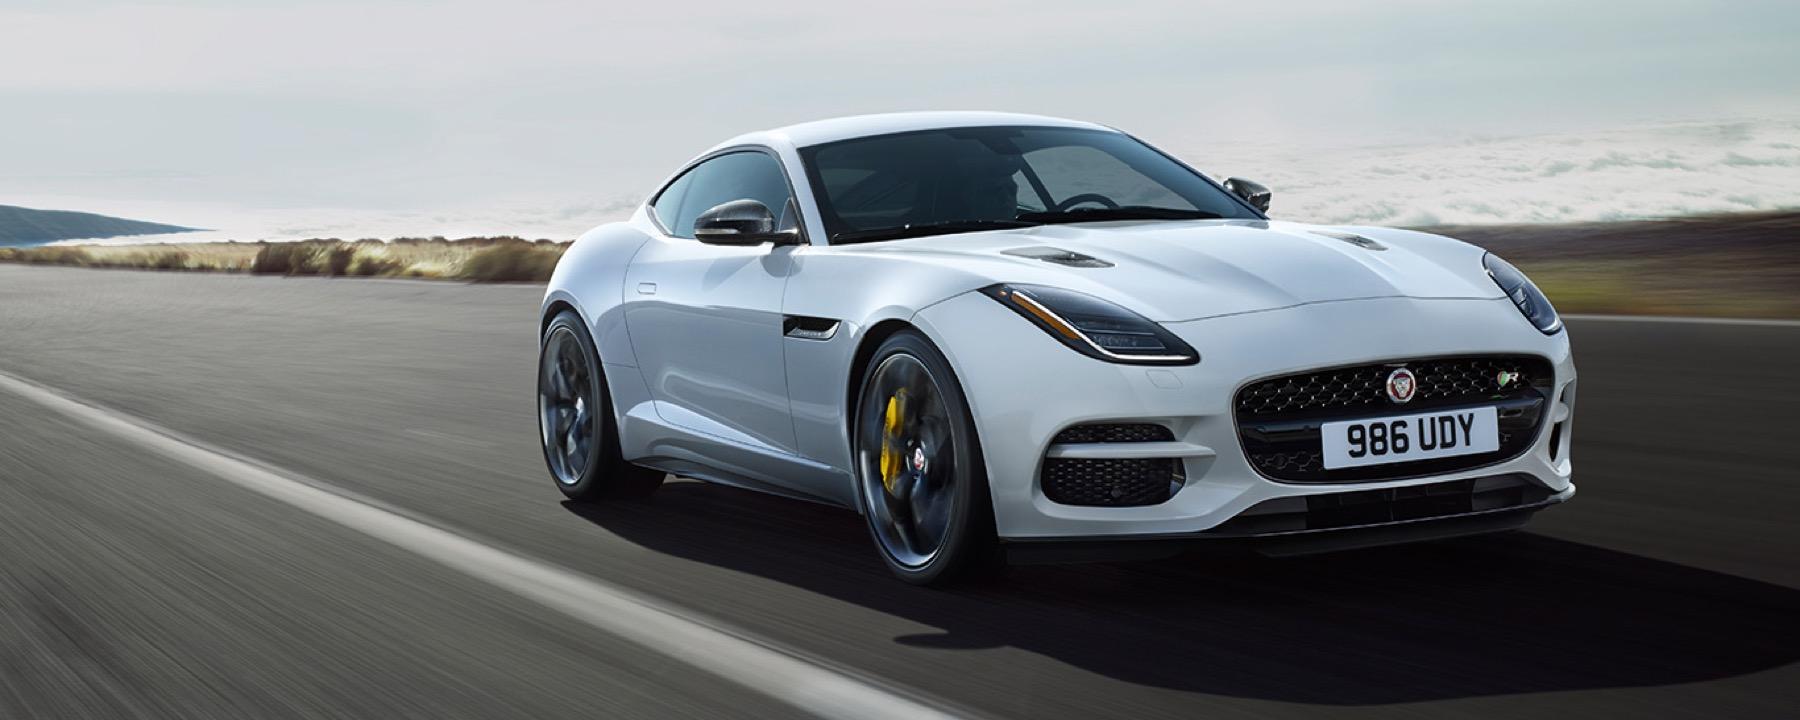 Jaguar Ftype Jpg